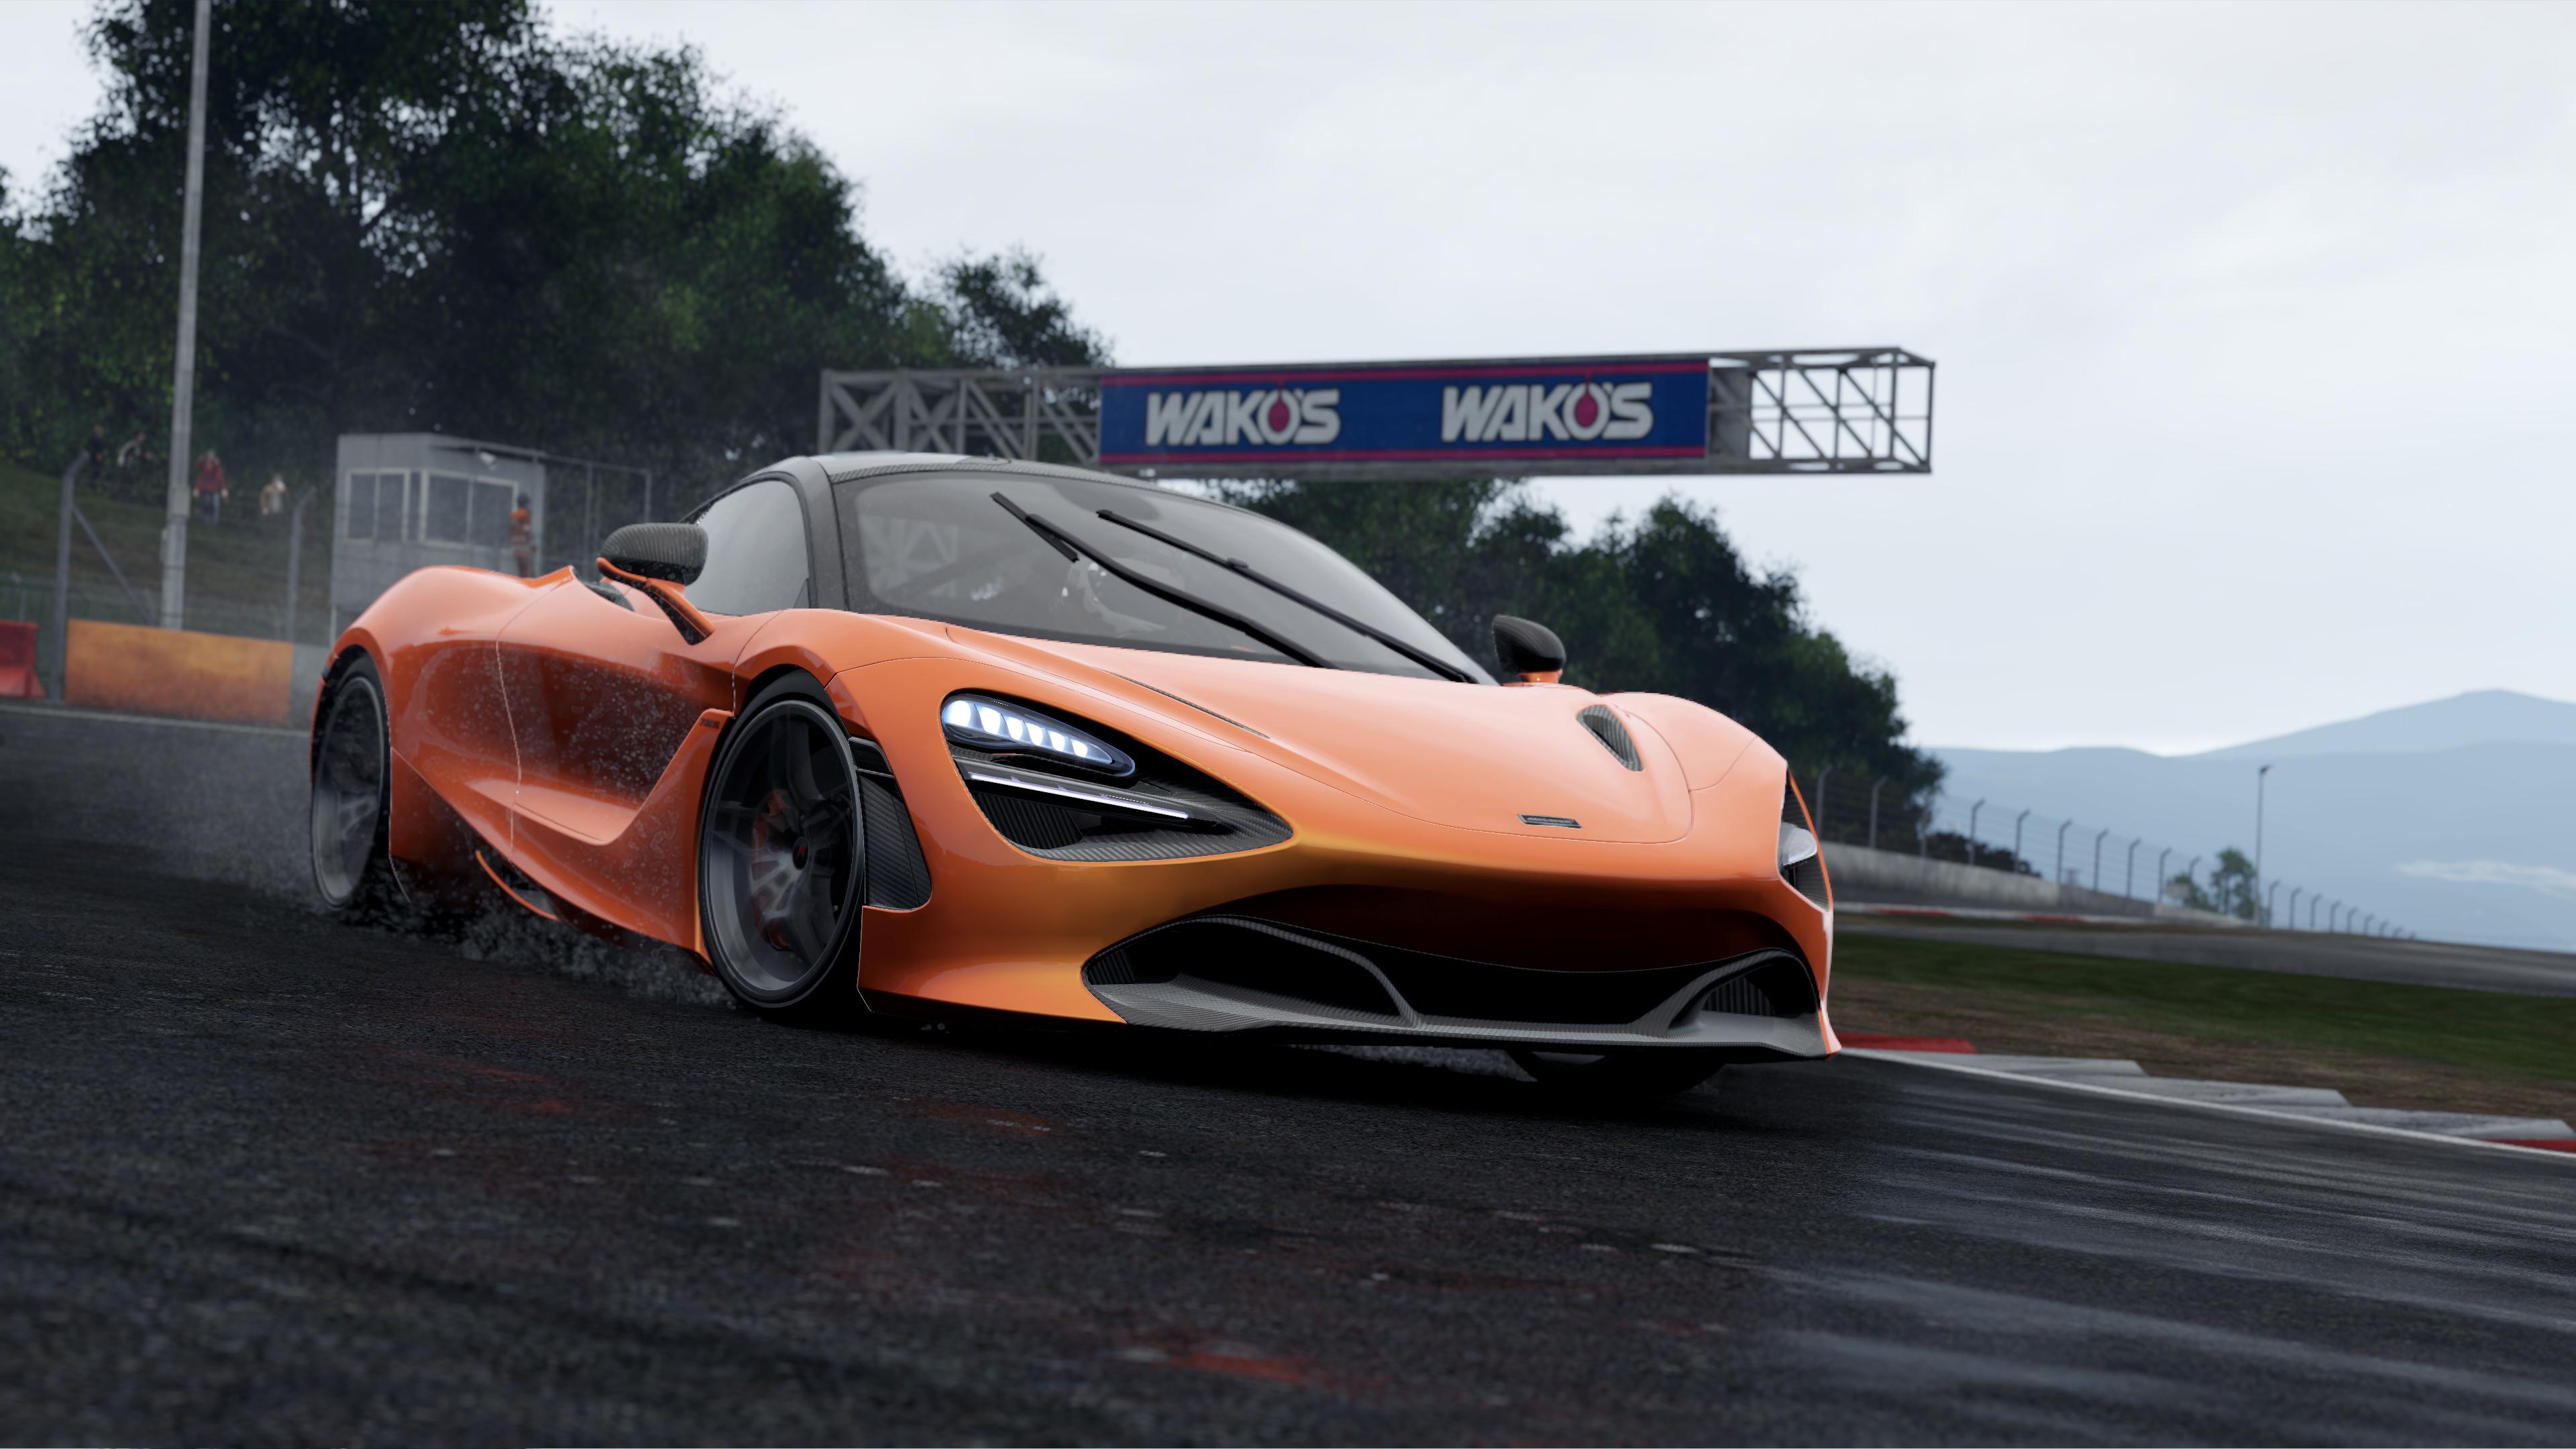 2560x1080 mclaren 720s project cars 2 2560x1080 resolution - Project cars 4k wallpaper ...